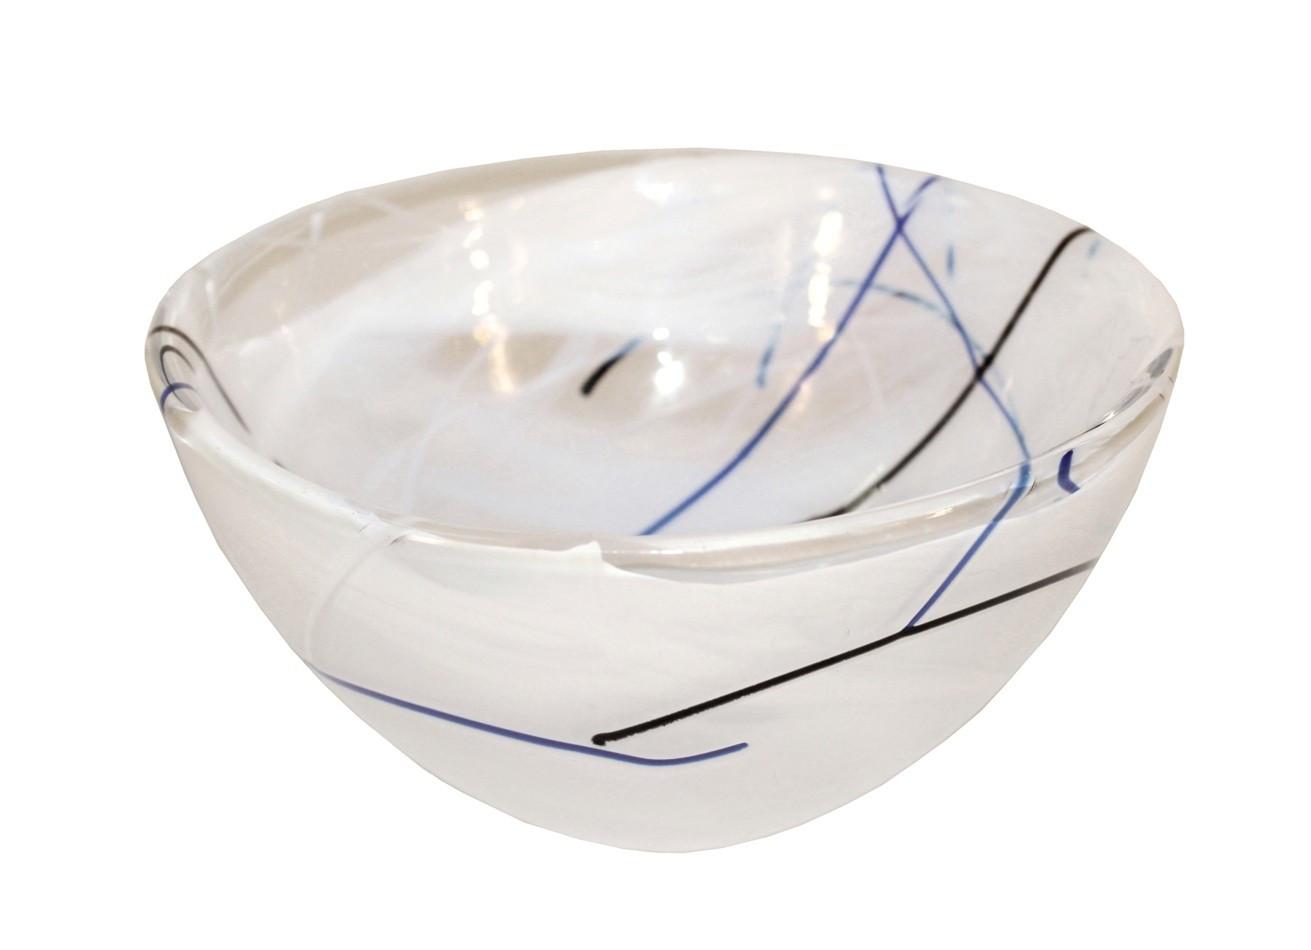 kosta boda contrast vase white of anna ehrner for kosta boda glass contrast bowl nyshowplace throughout anna ehrner for kosta boda glass contrast bowl